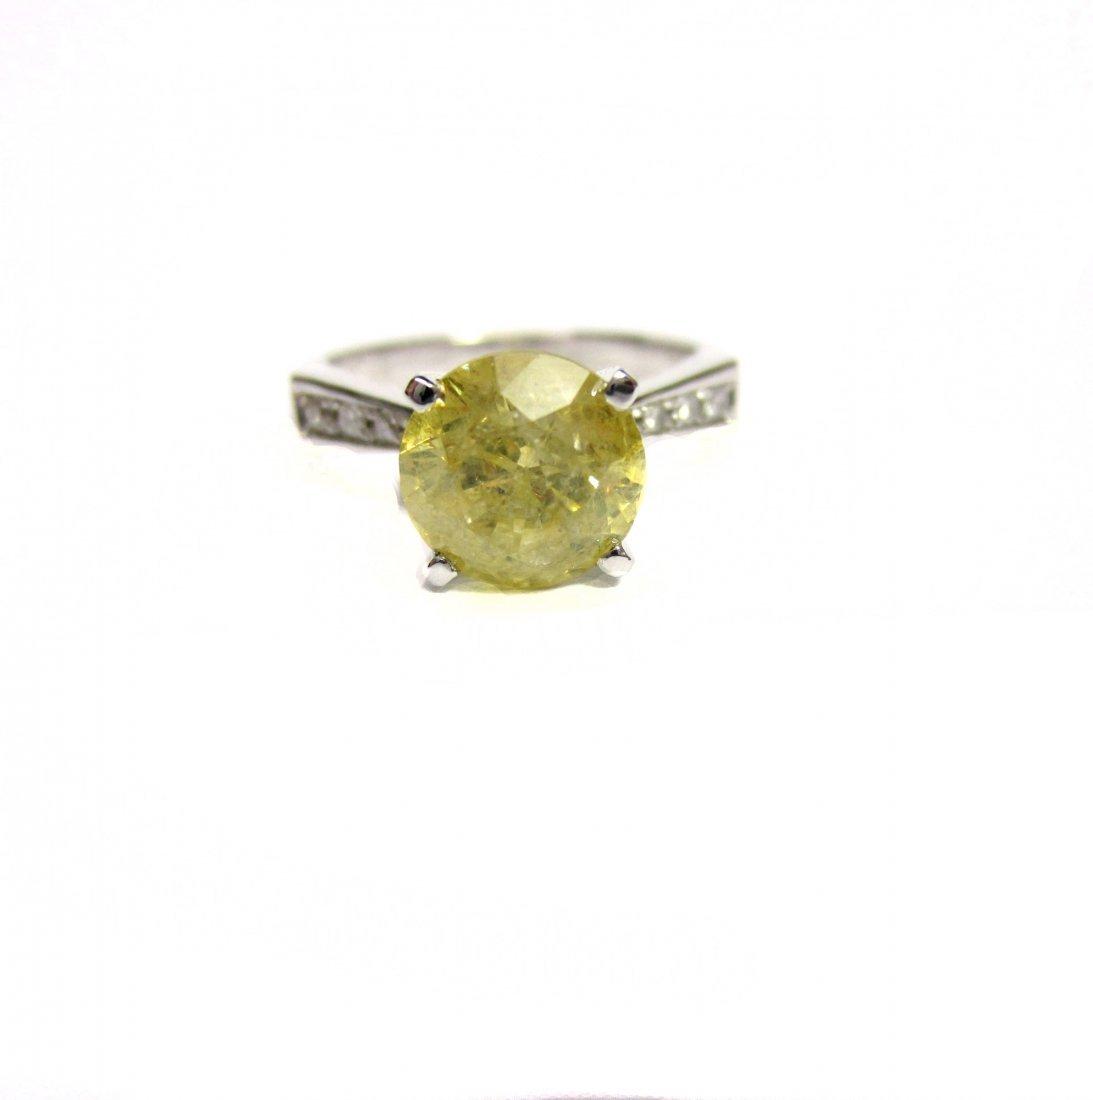 Diamond Ring 1.83 ct Total, Fancy Yellow